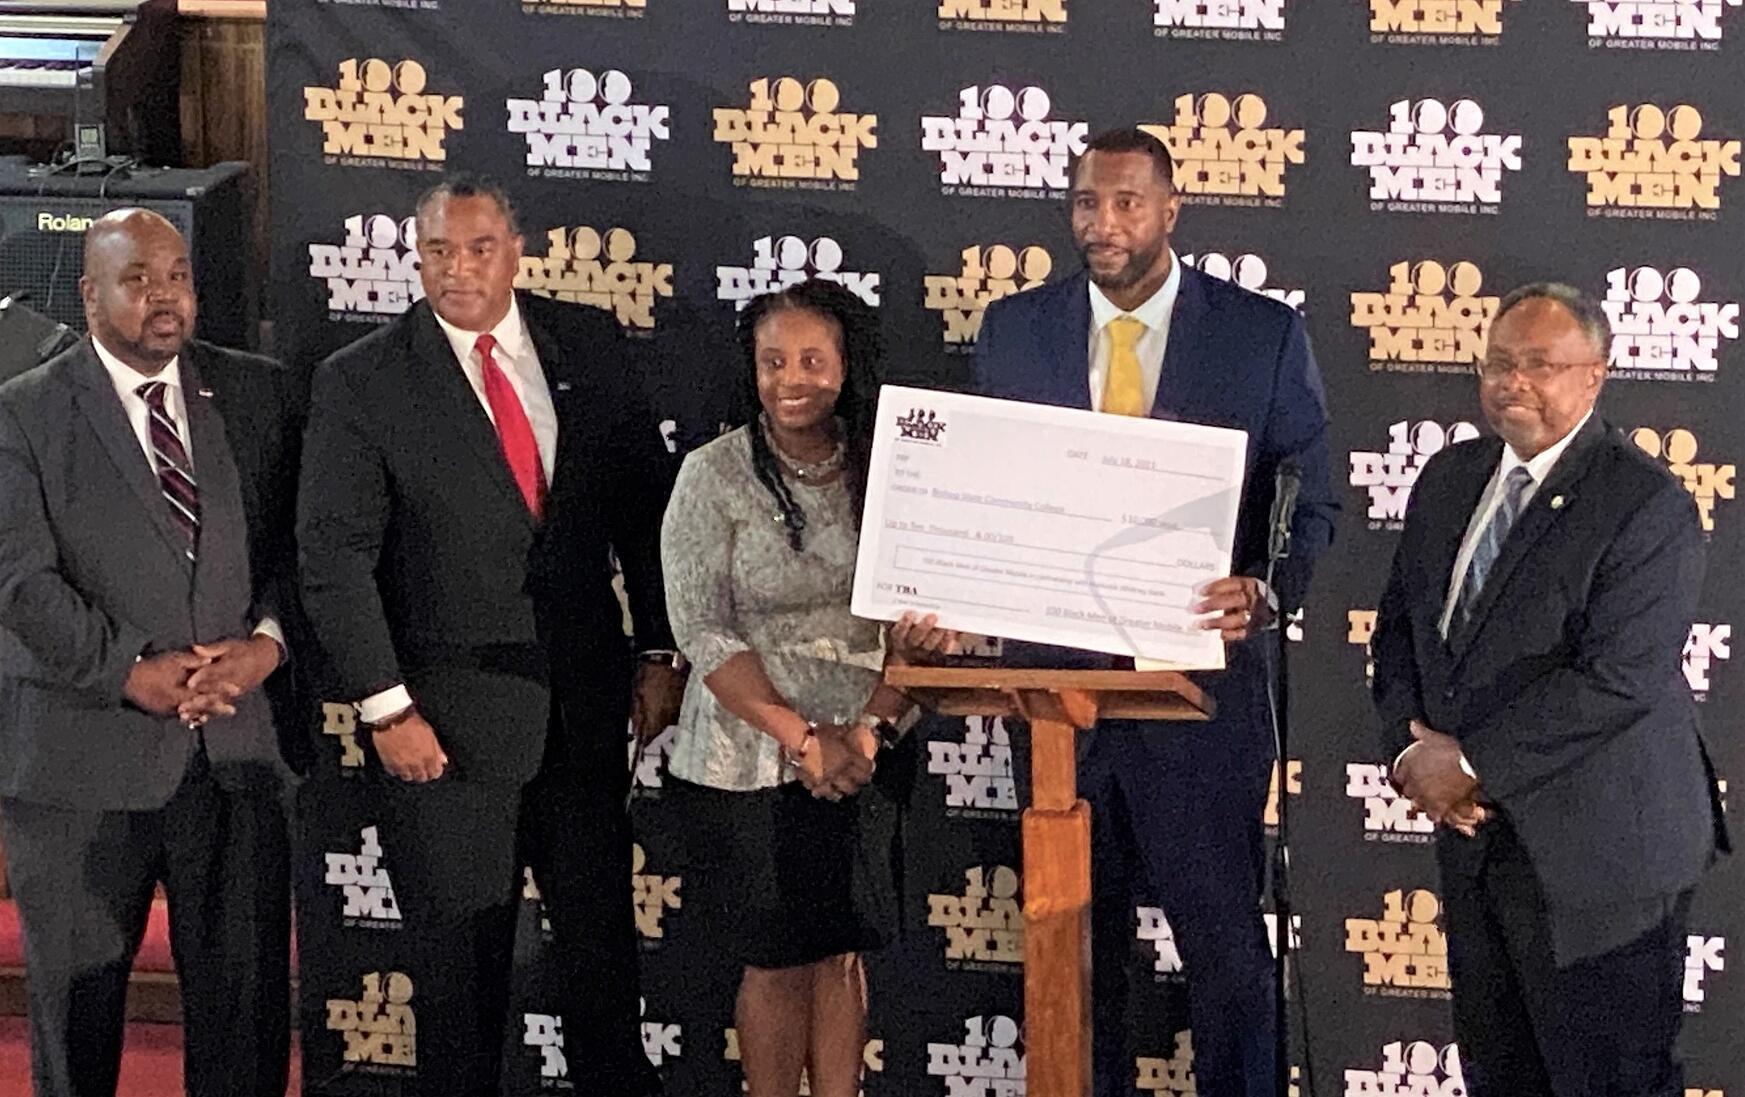 Bishop State - Hancock Whitney - 100 Black Men of Greater Mobile Inc - Scholarship